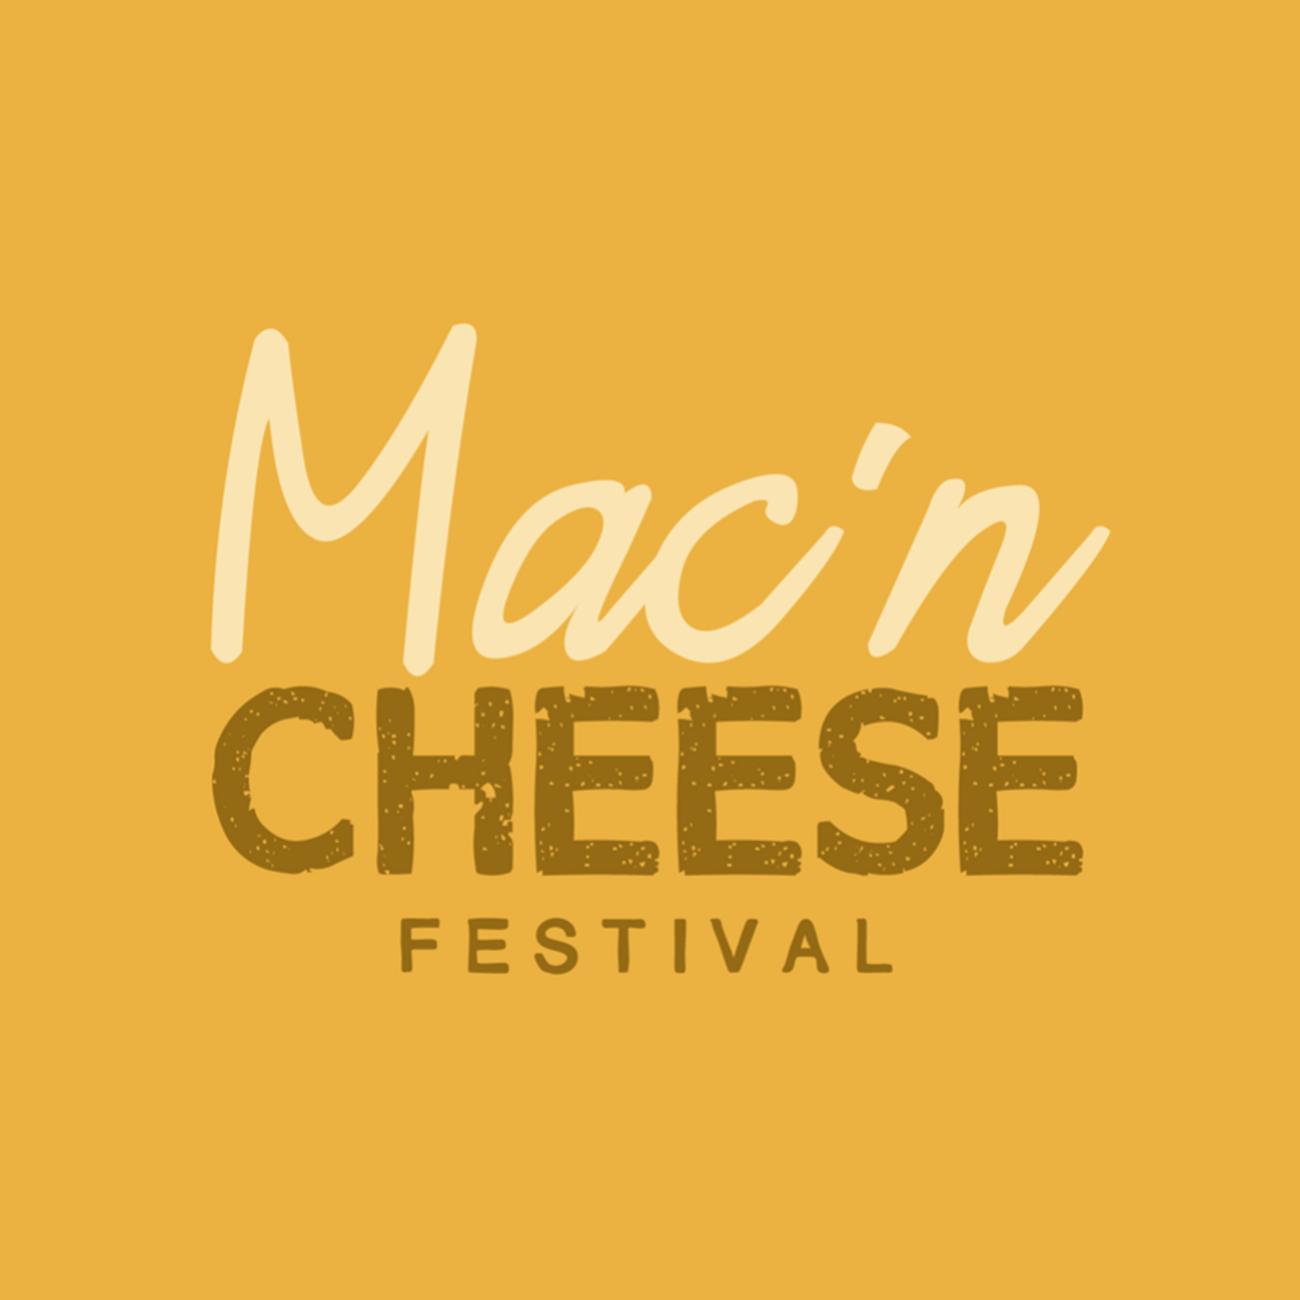 How To Make Craft Mac N Cheese Better